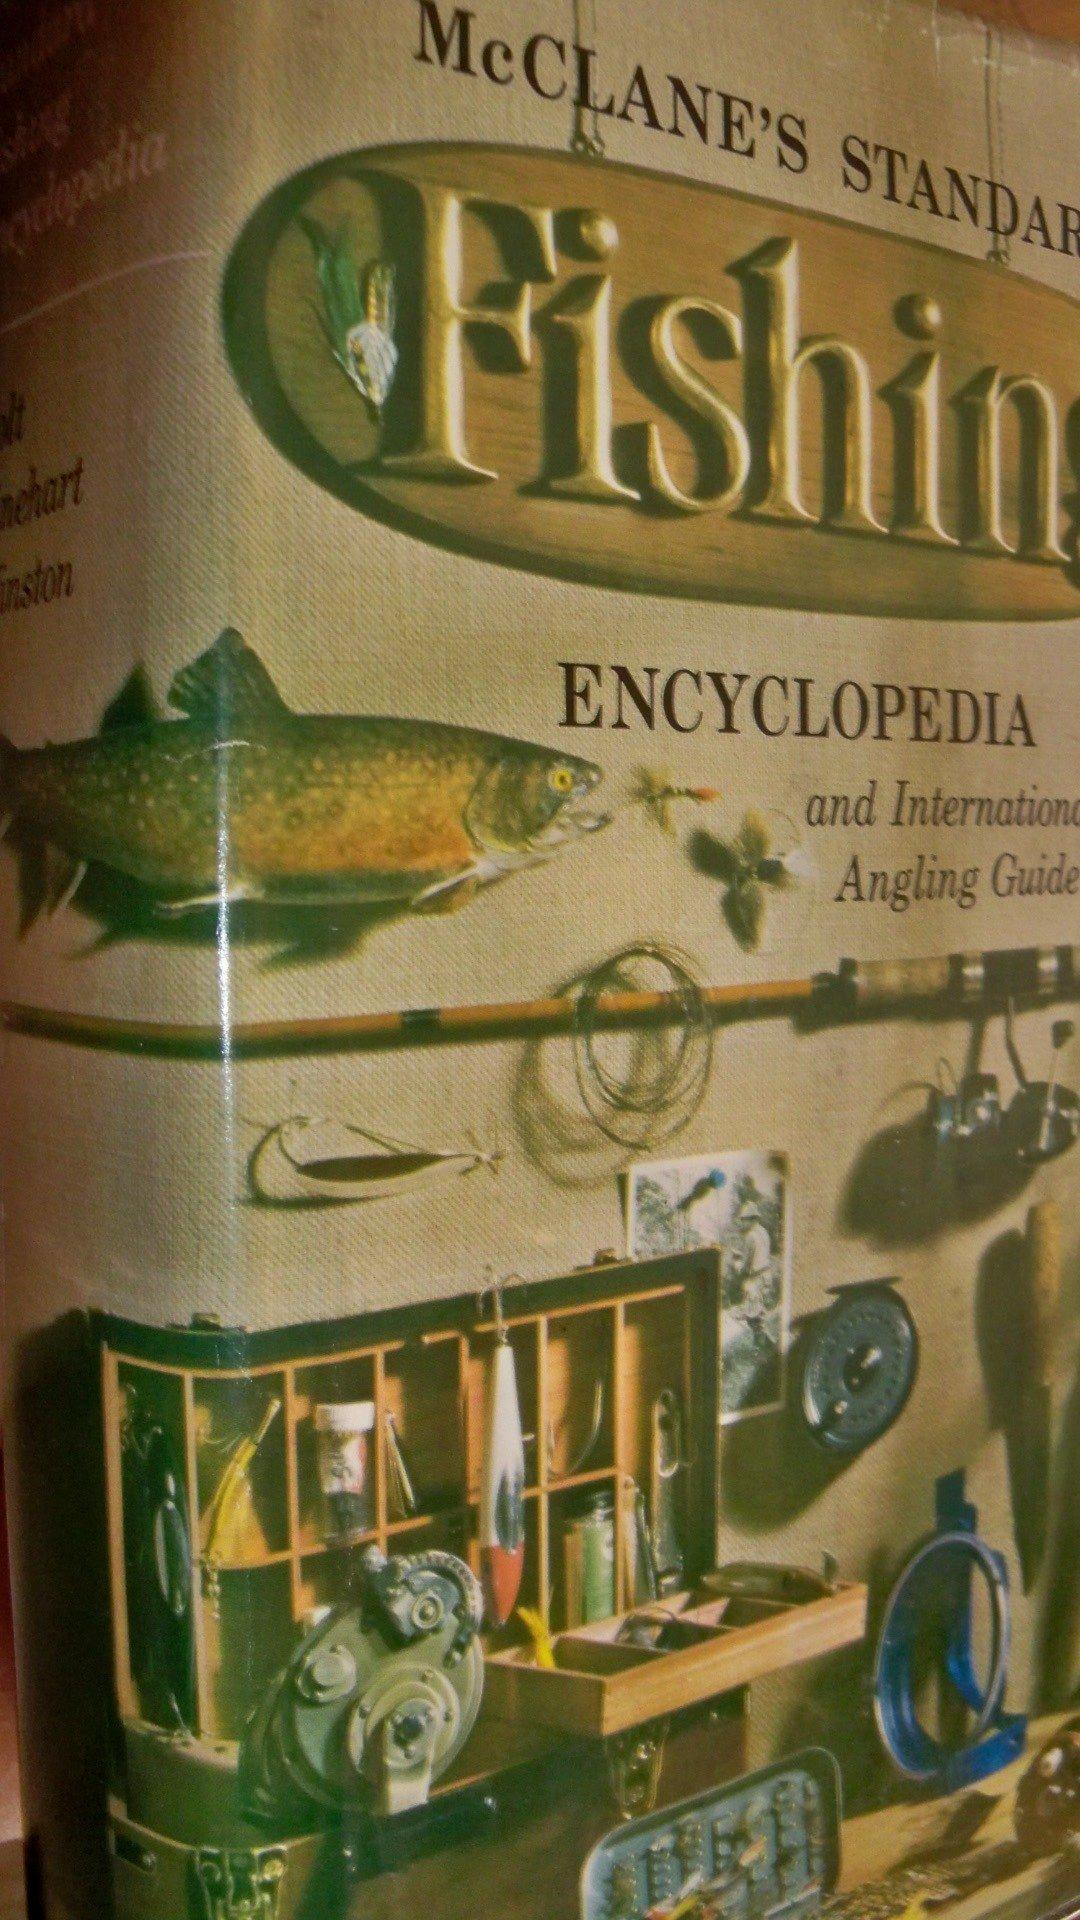 McClanes Standard Fishing Encyclopedia International product image